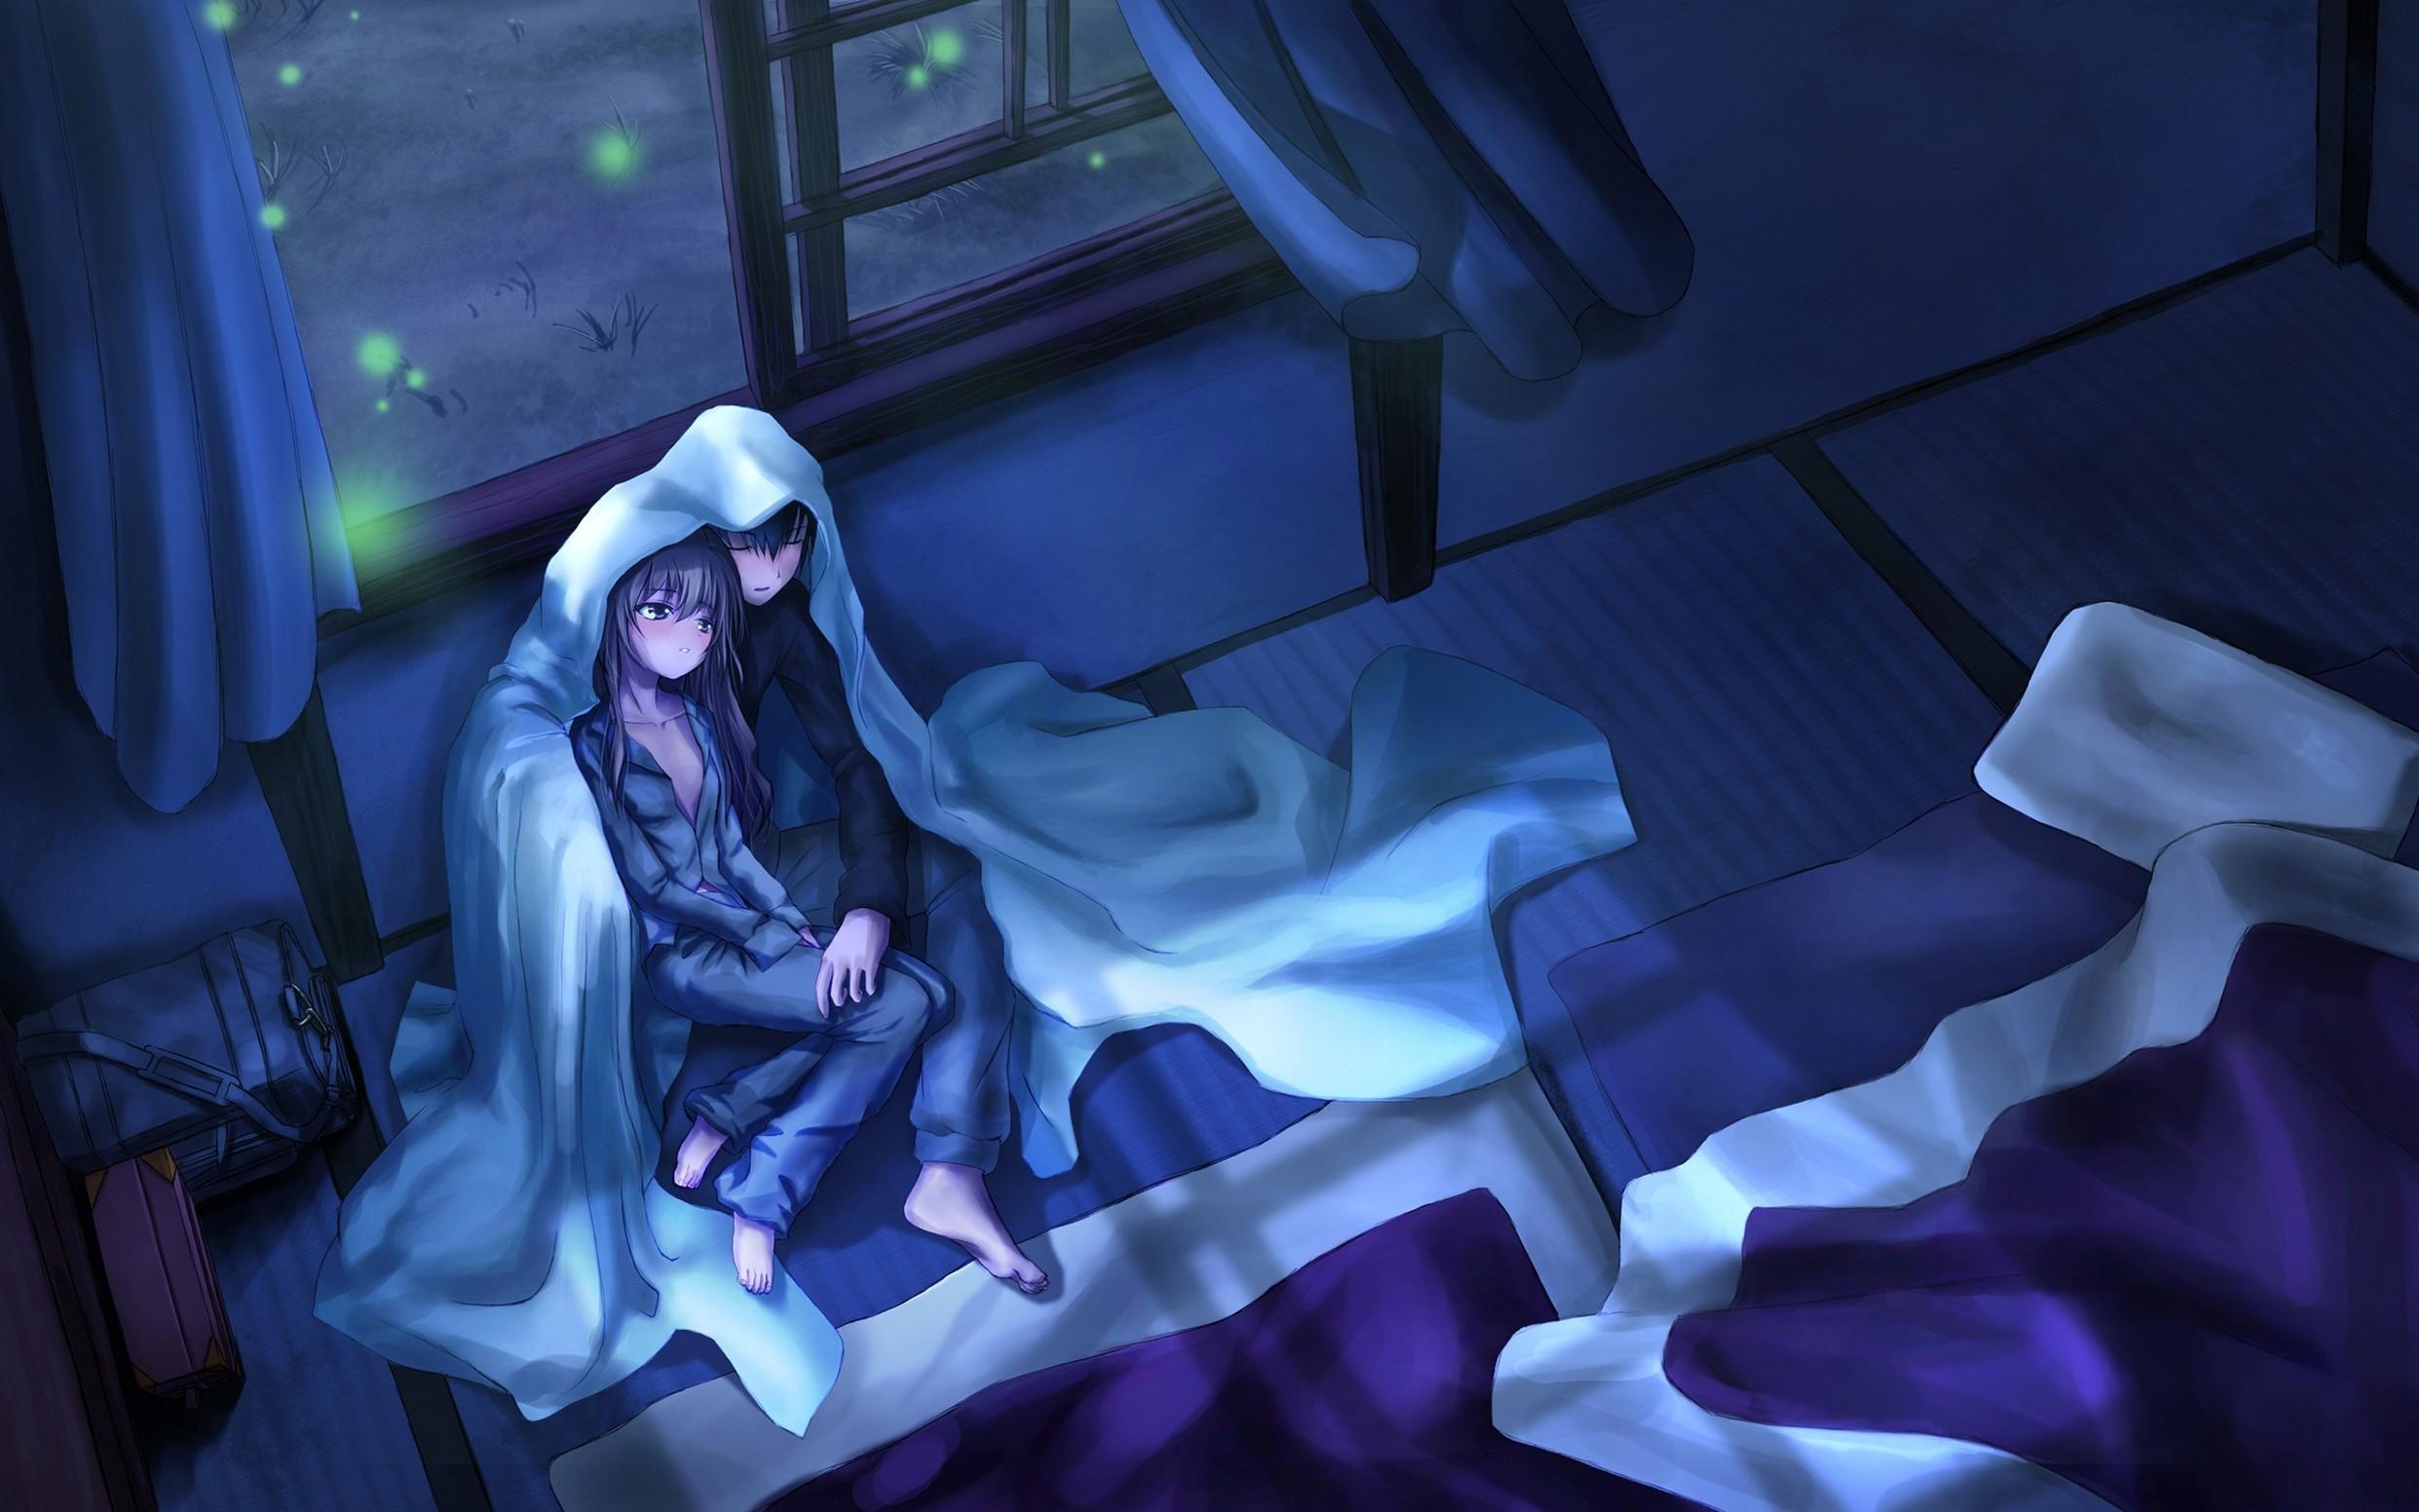 Boy Girl Night Blanket Room Superb Anime Phone Wallpapers